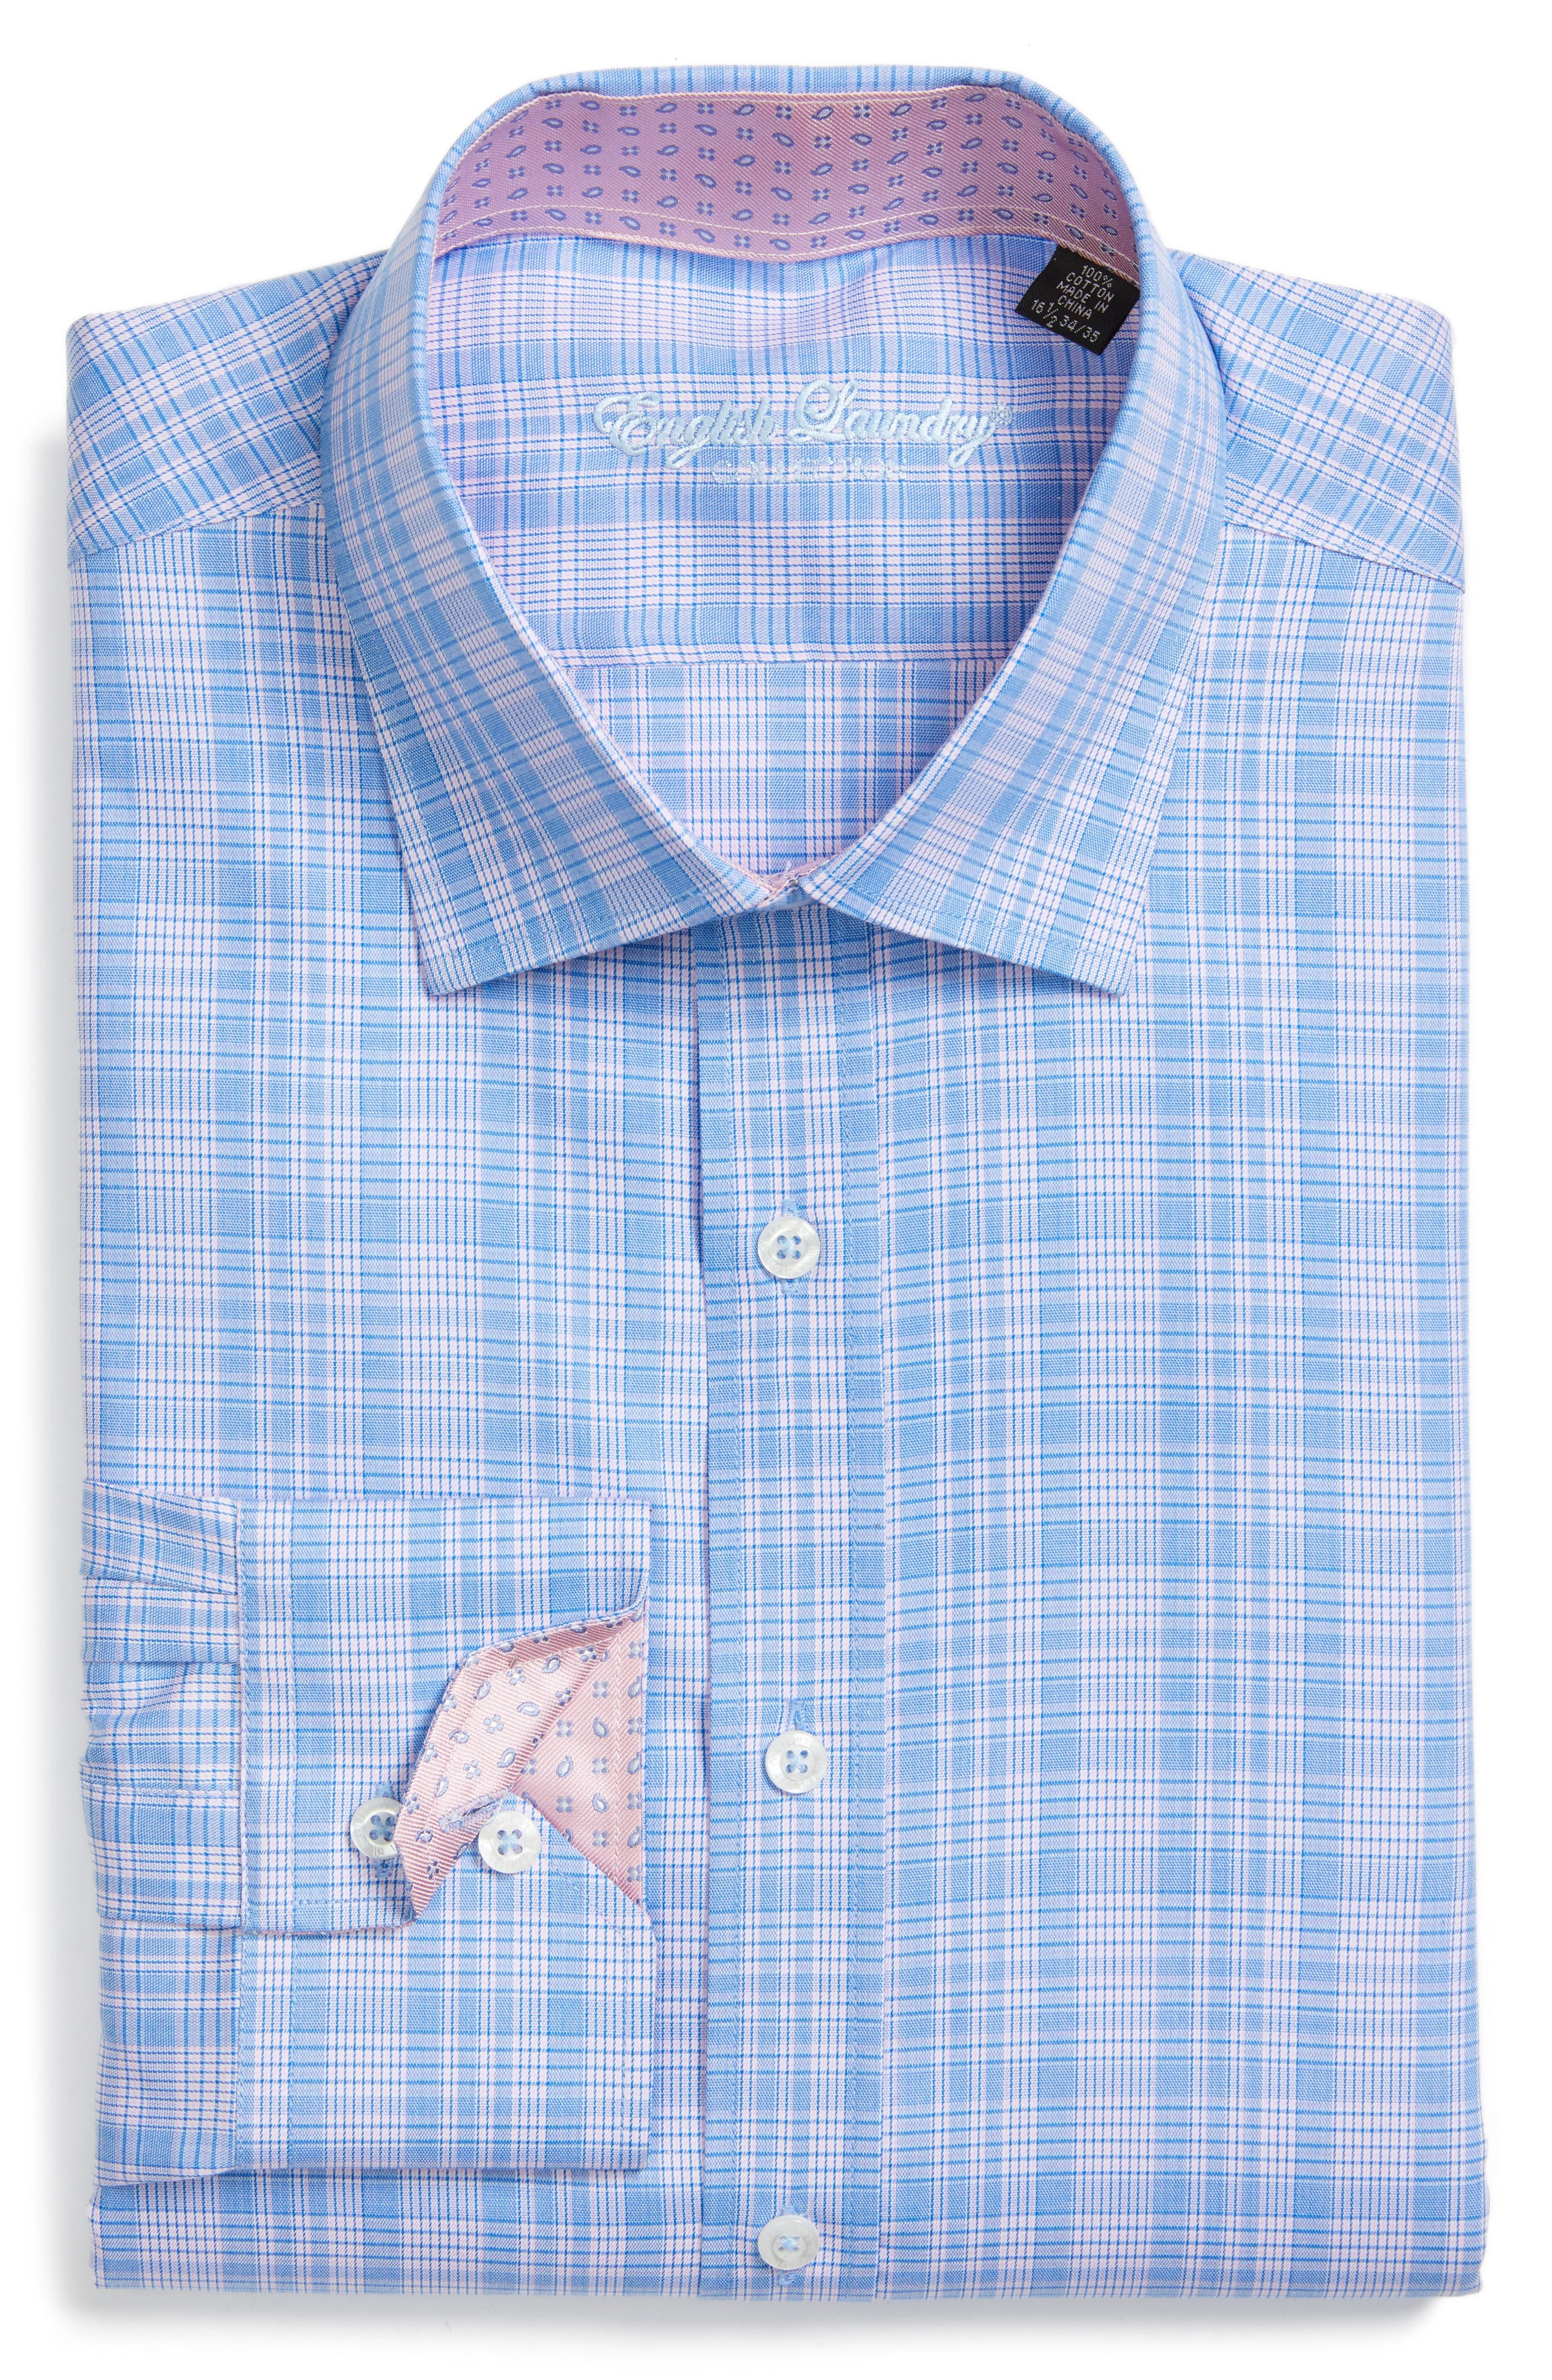 Alternate Image 1 Selected - English Laundry Trim Fit Plaid Dress Shirt